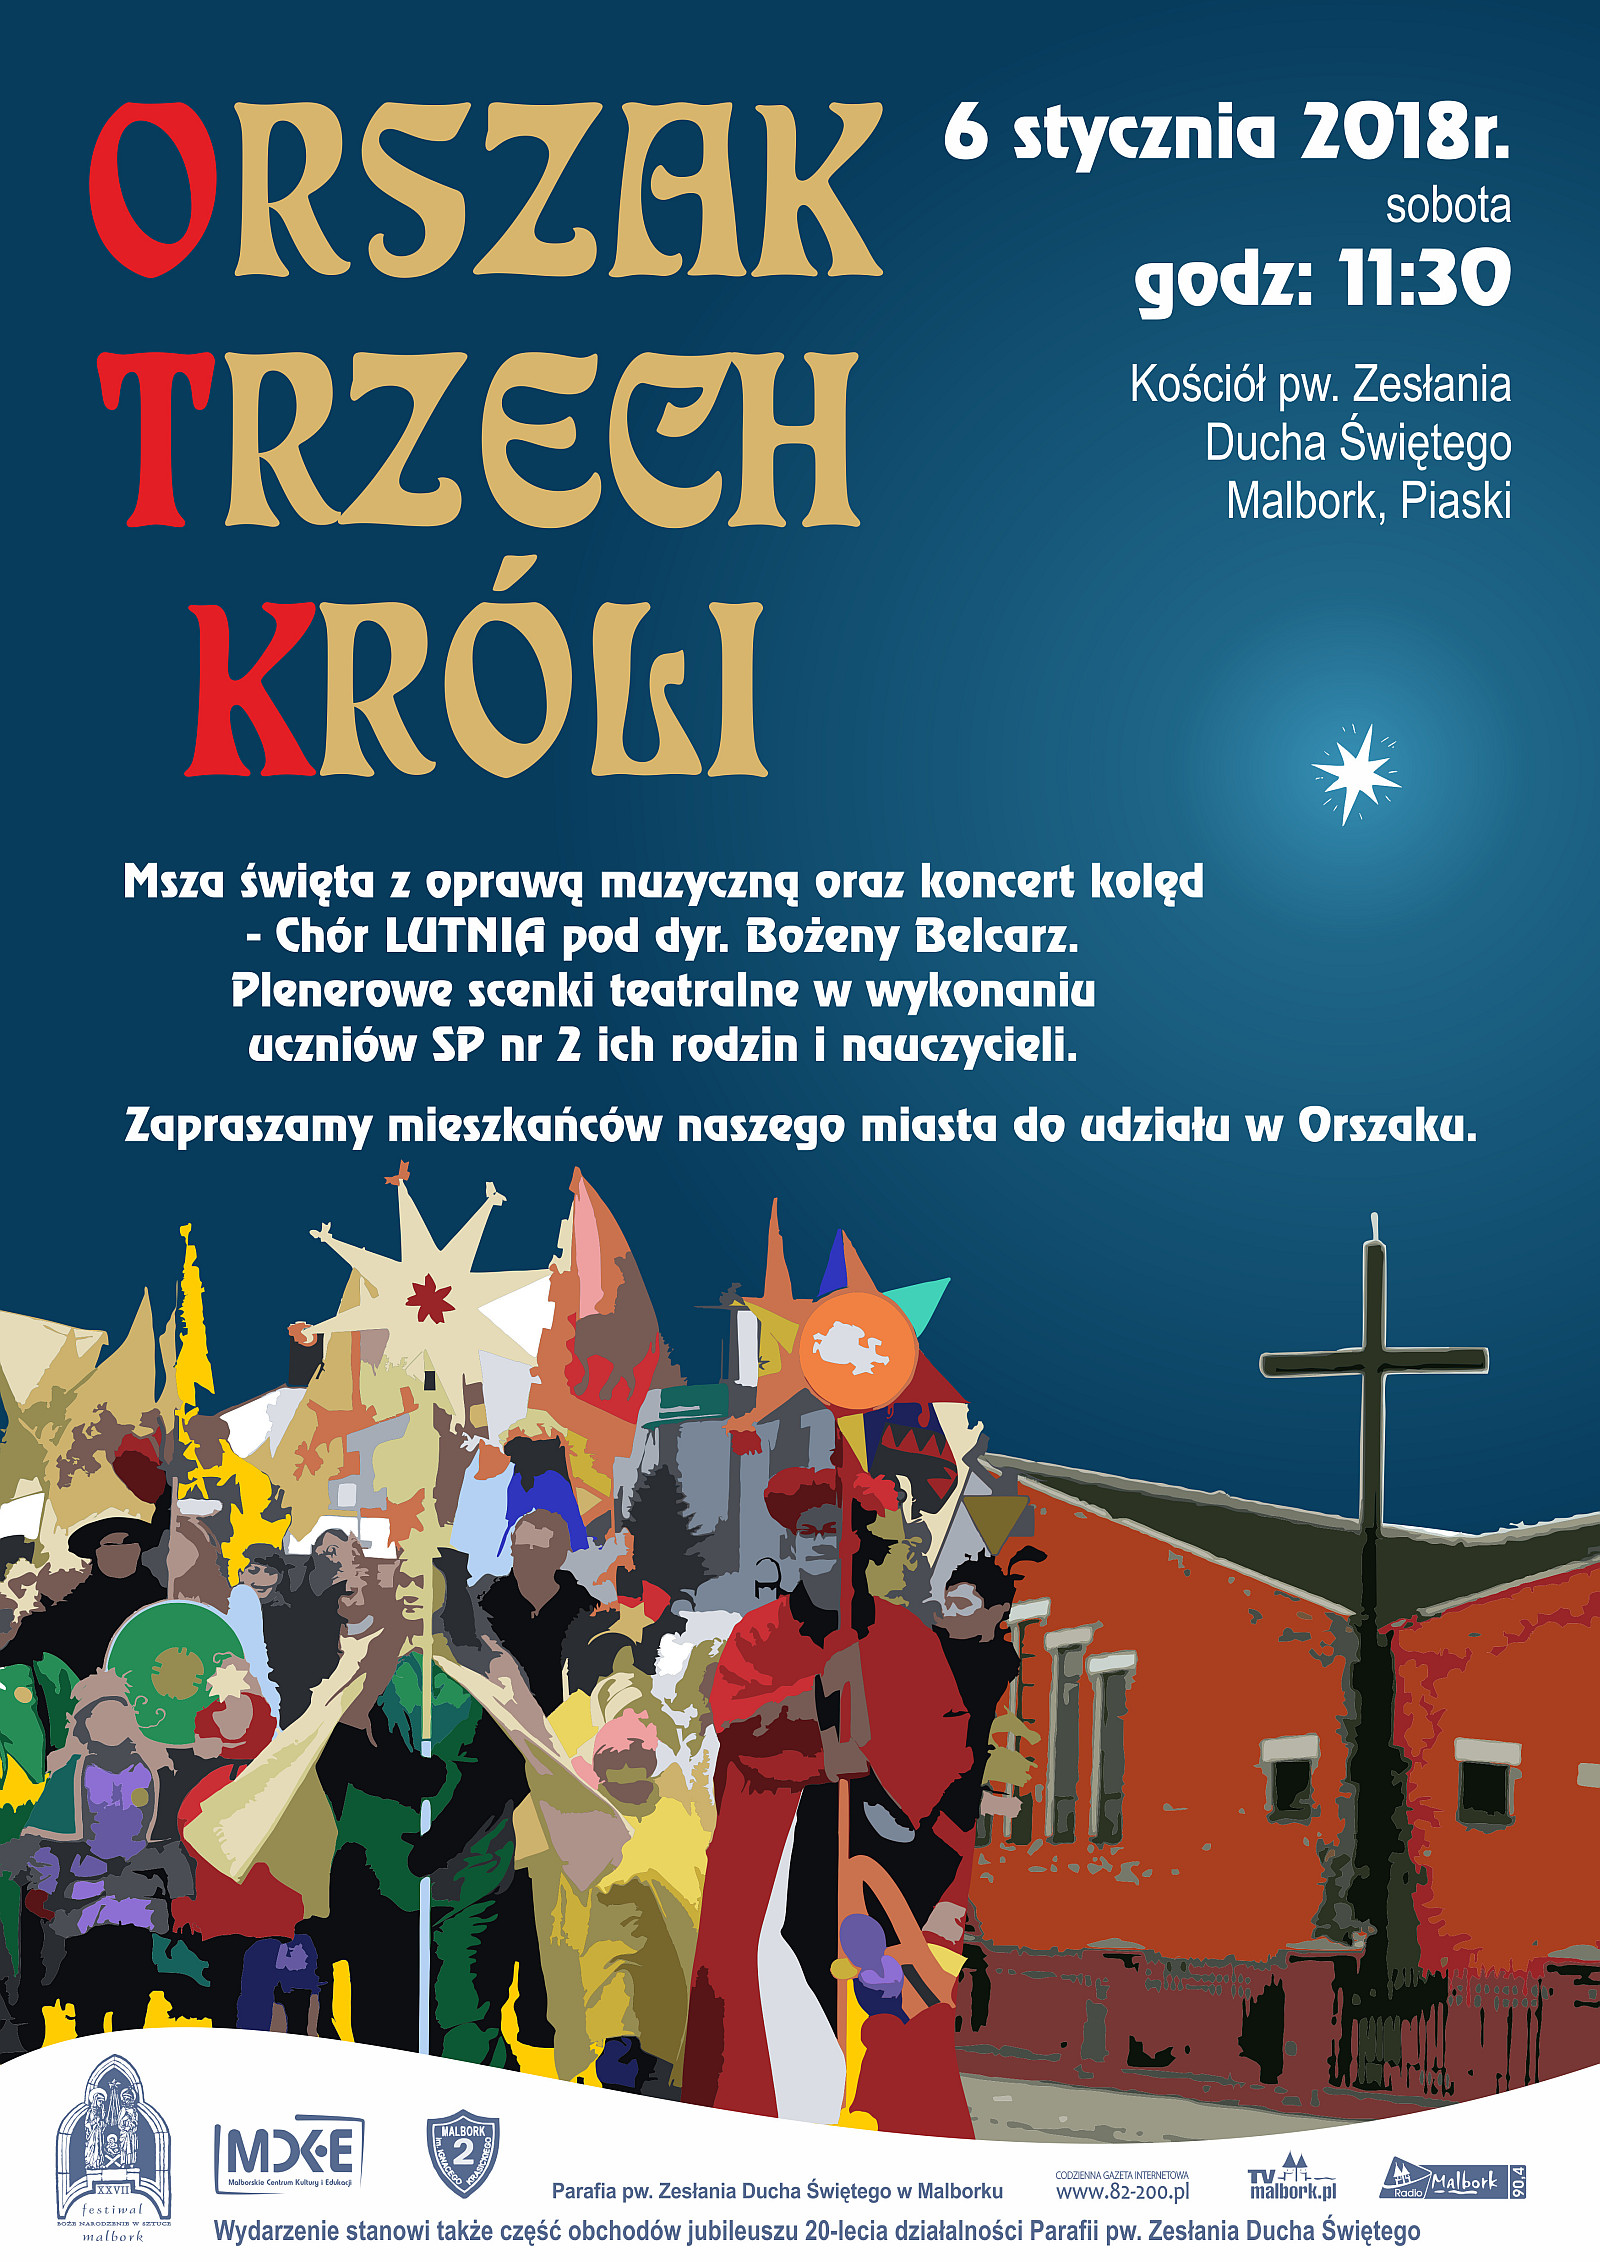 http://m.82-200.pl/2017/12/orig/plakat3kroli-2195.jpg